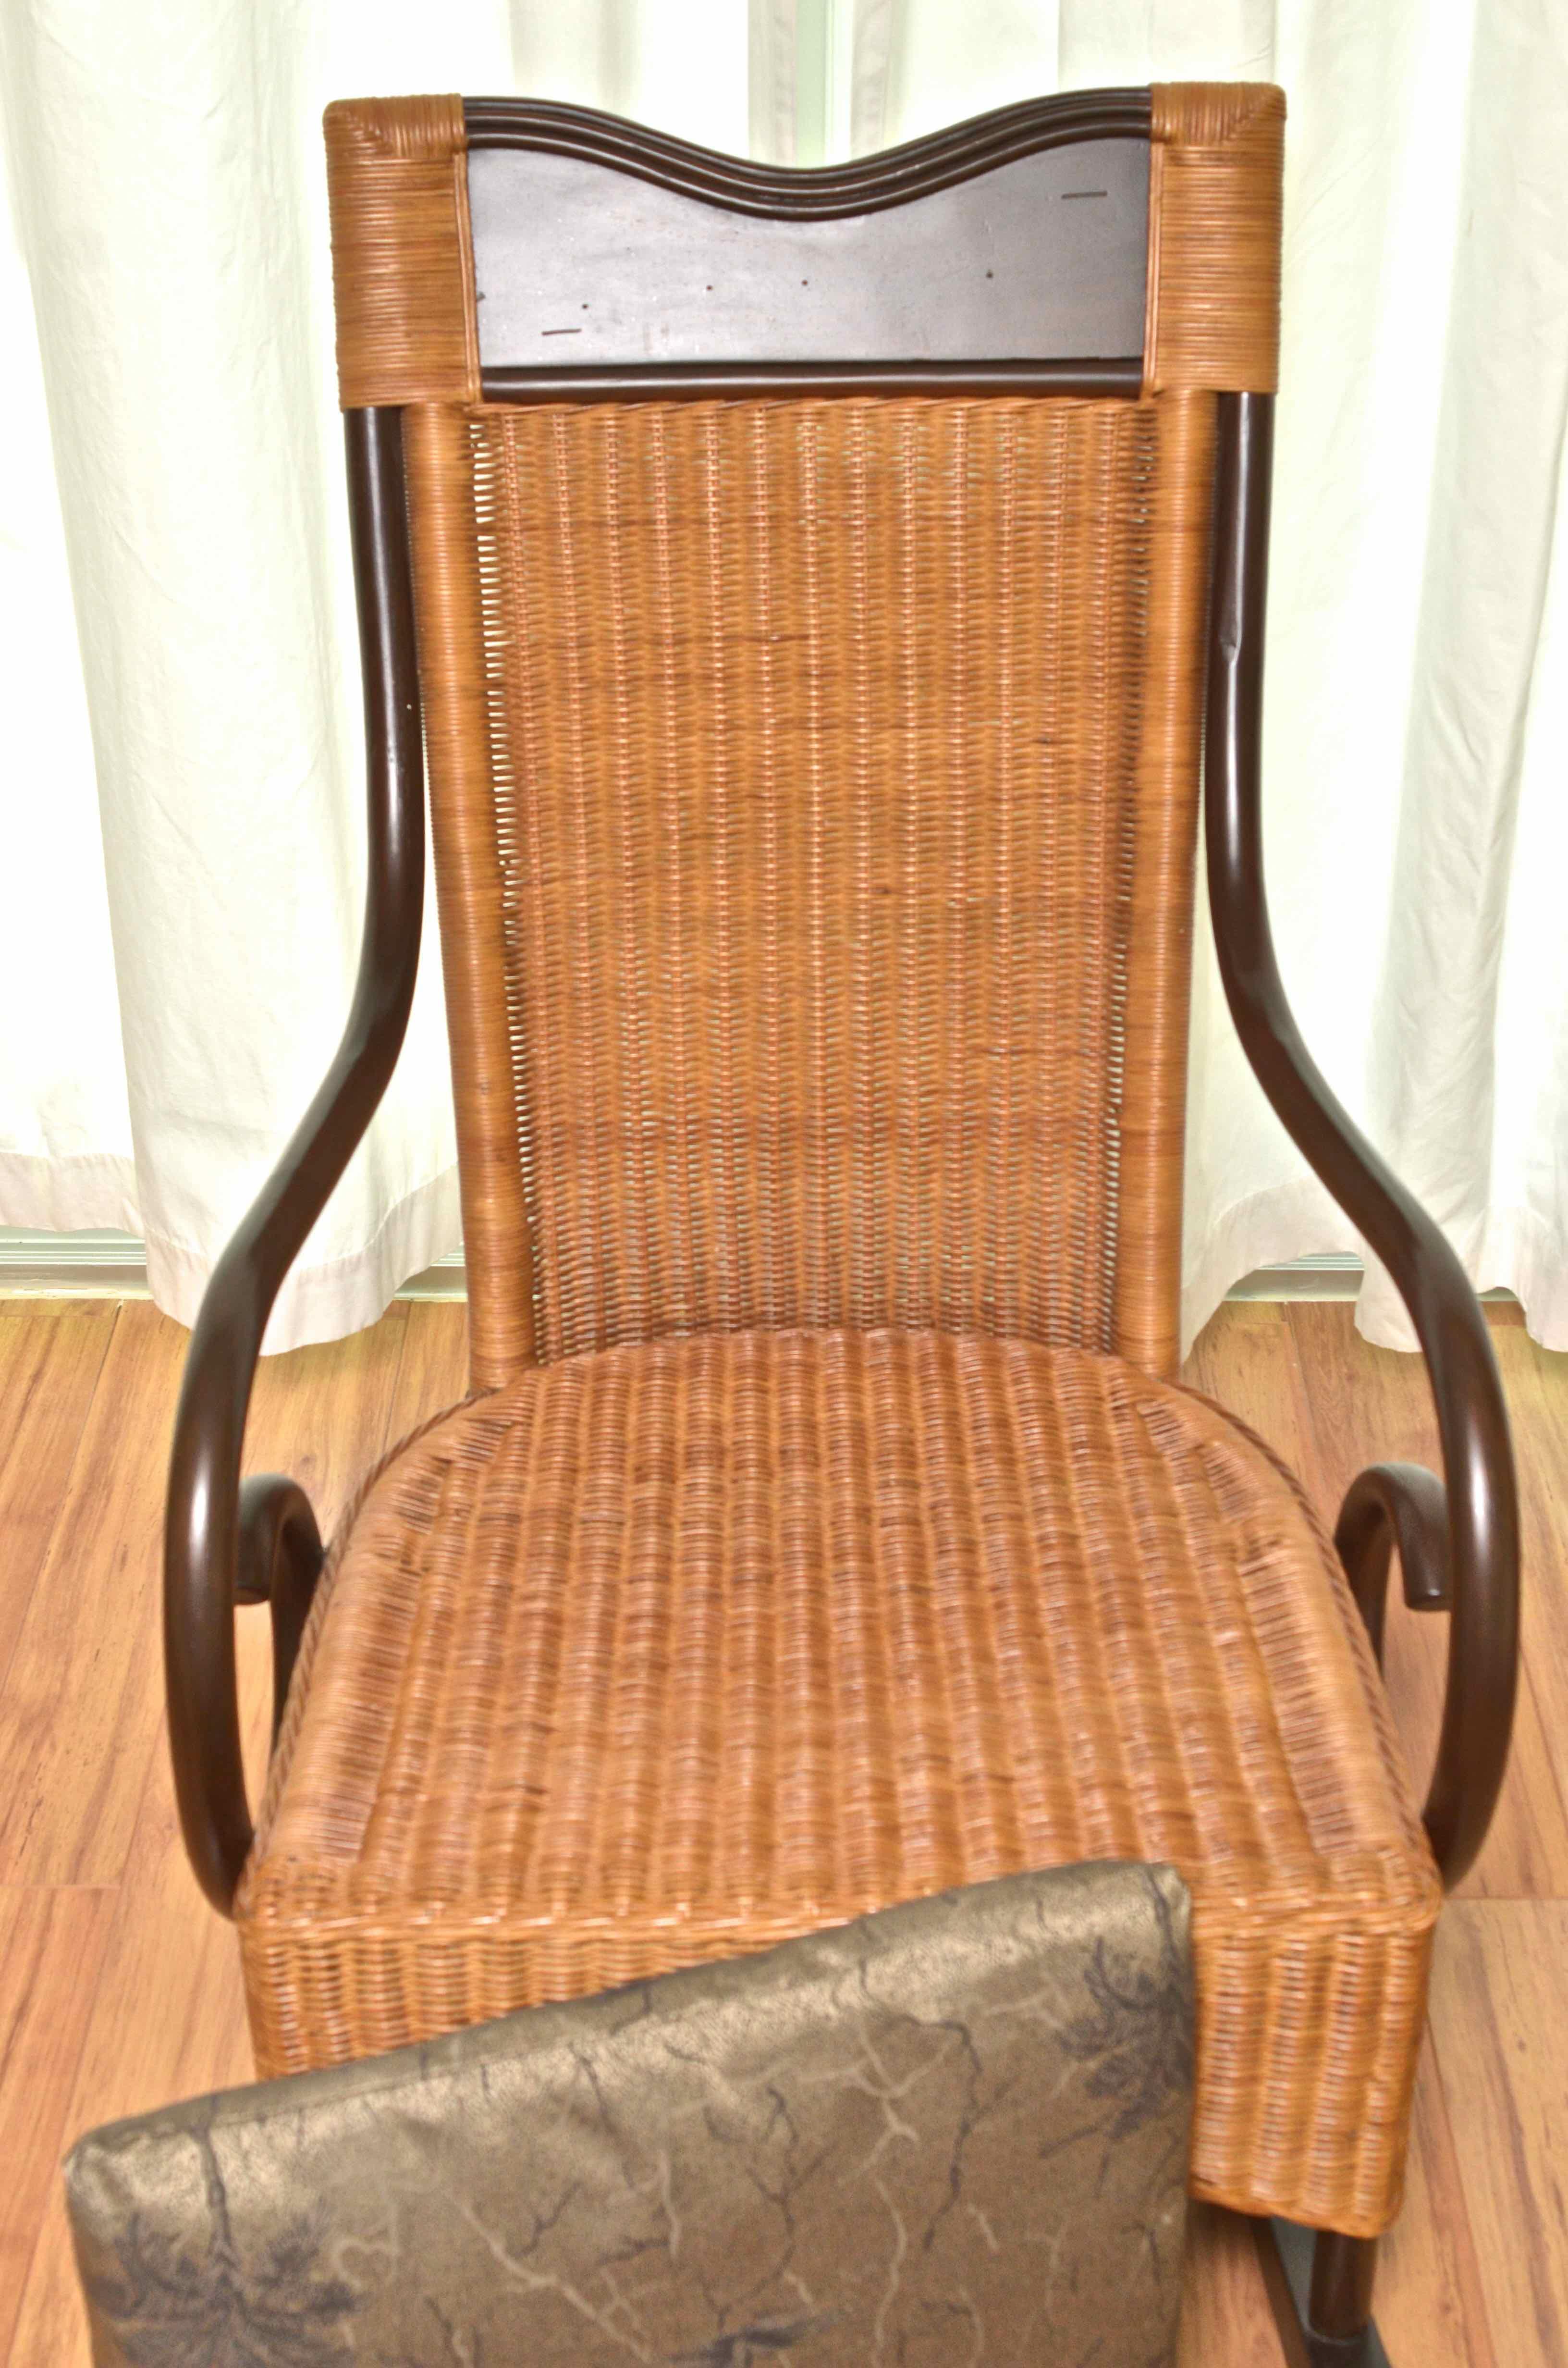 wicker rocking chair pier one recliner office singapore 1 rocker ebth